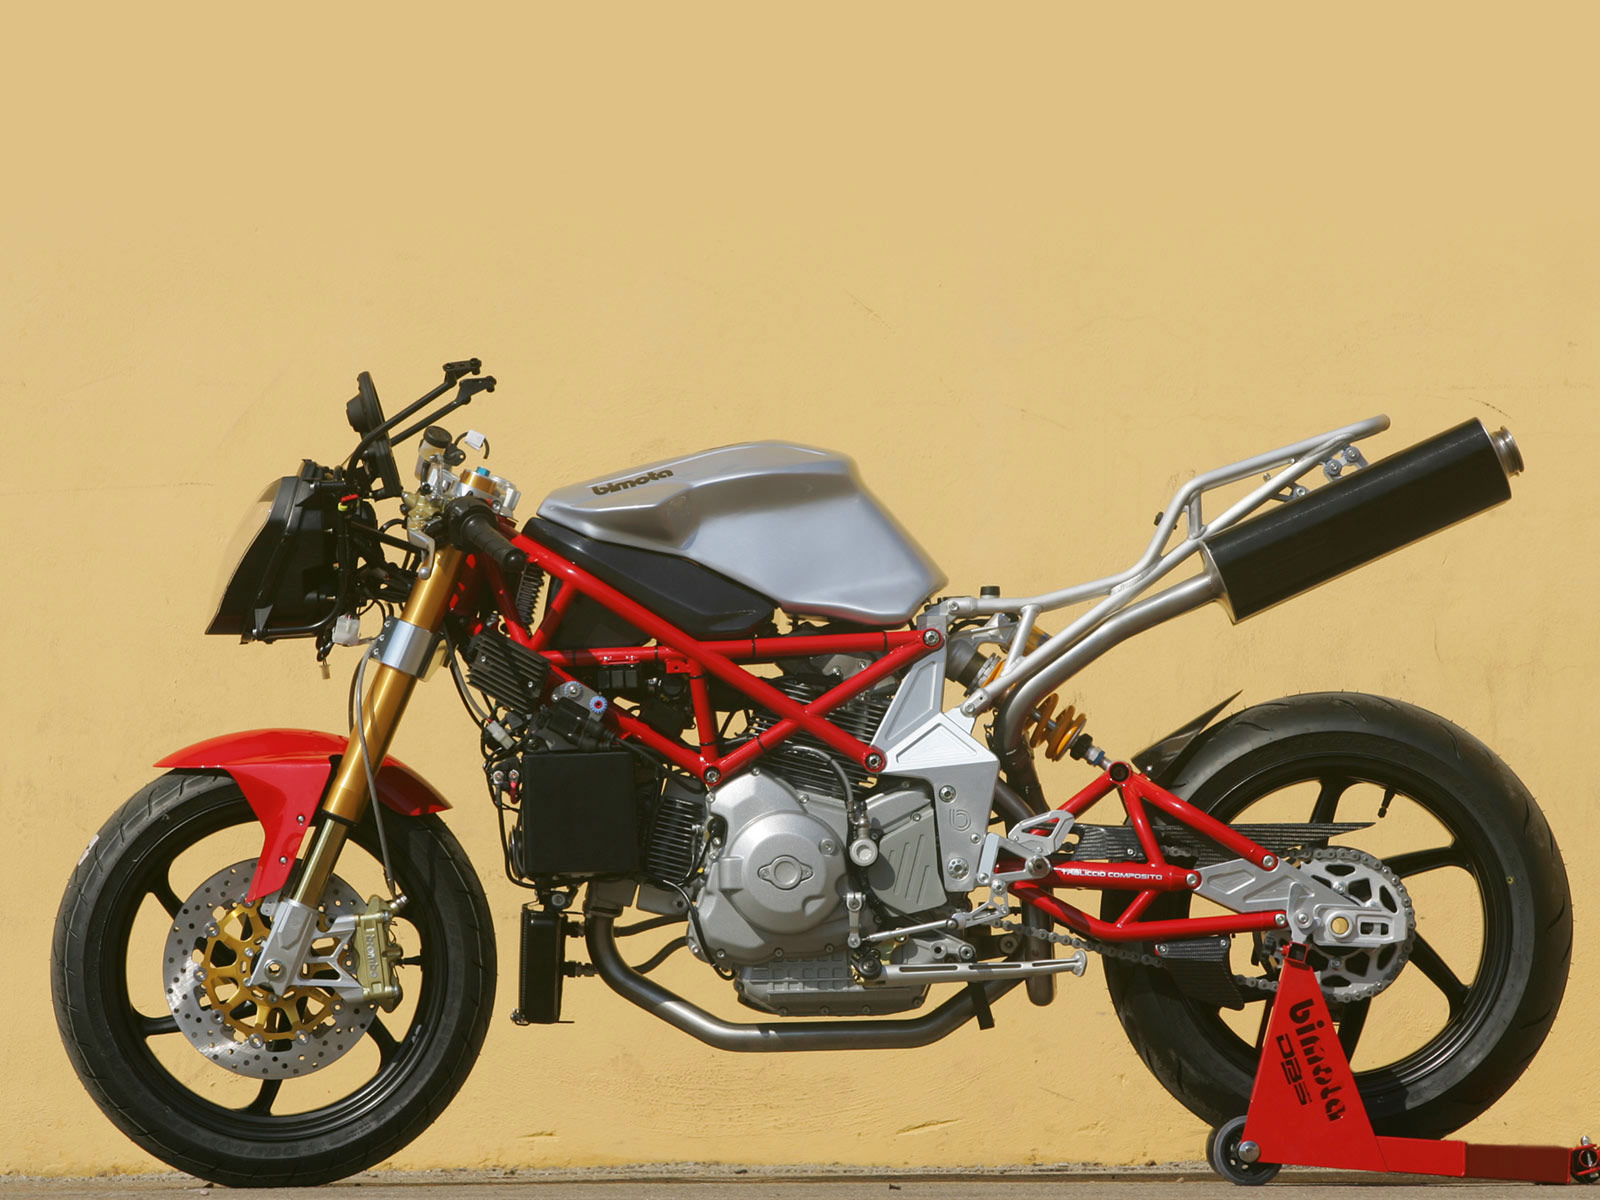 http://4.bp.blogspot.com/-0Z6vI2OntA8/Tr4-jrkXewI/AAAAAAAAEEY/qQs-3vLB-p4/s1600/2006-Bimota-DB5-1000_motorcycle-desktop-wallpaper_7.jpg